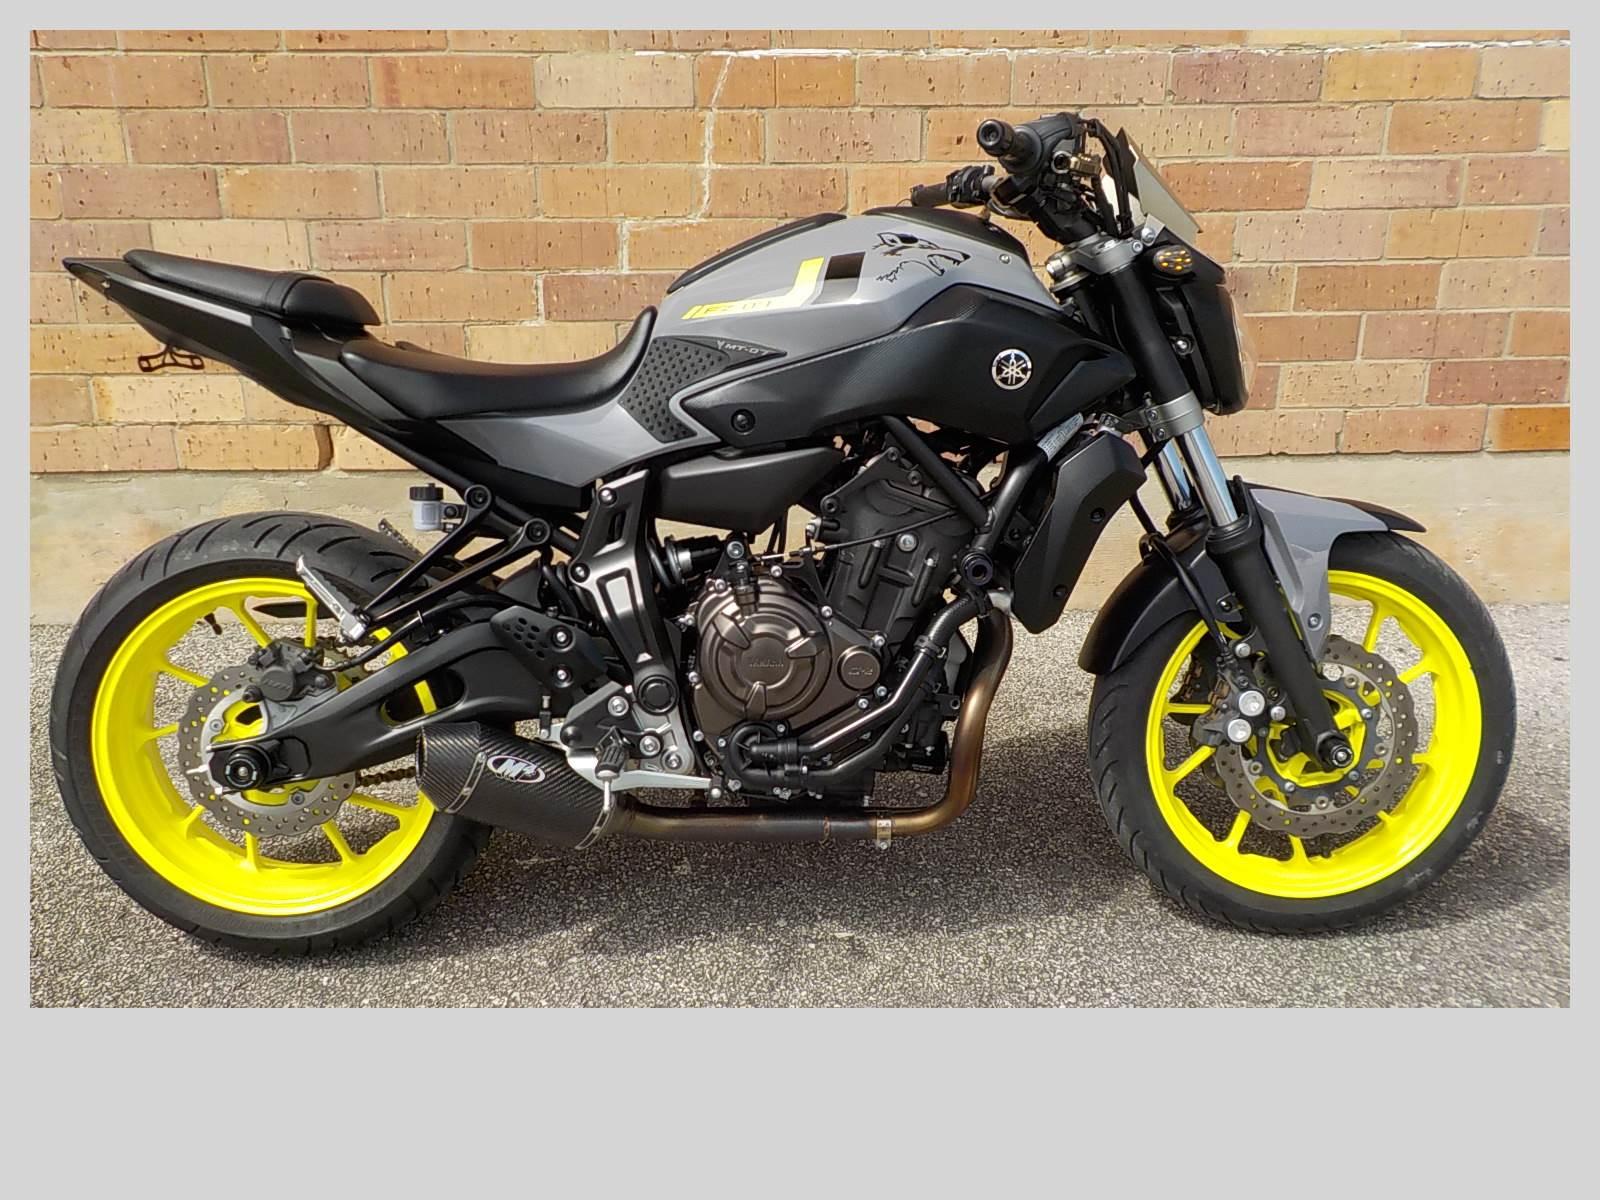 2016 Yamaha FZ-07 for sale 124762